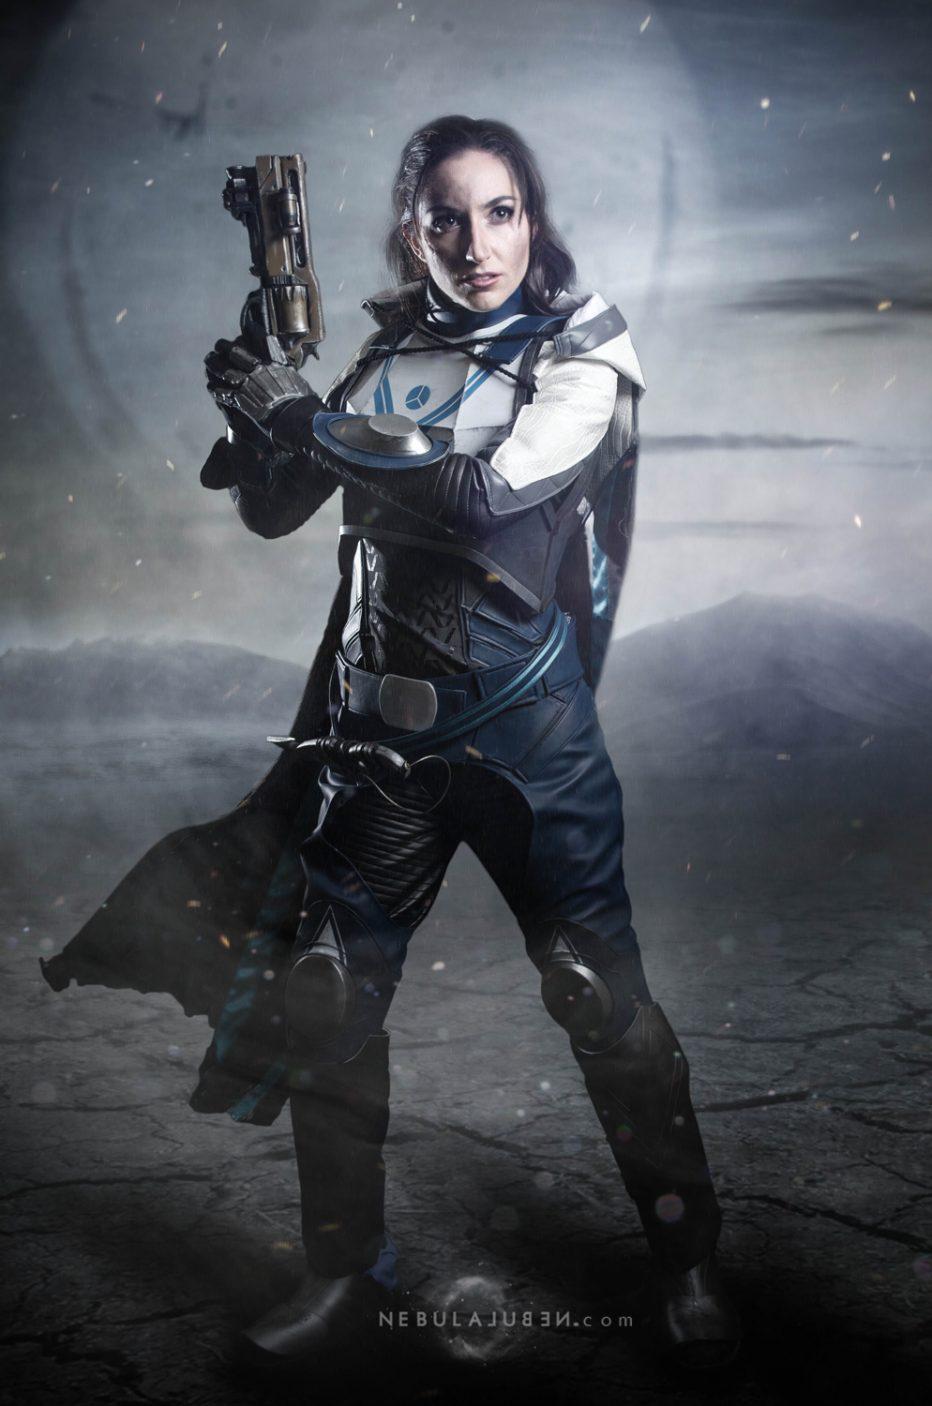 Destiny-2-Huntress-Cosplay-Gamers-Heroes-3.jpg